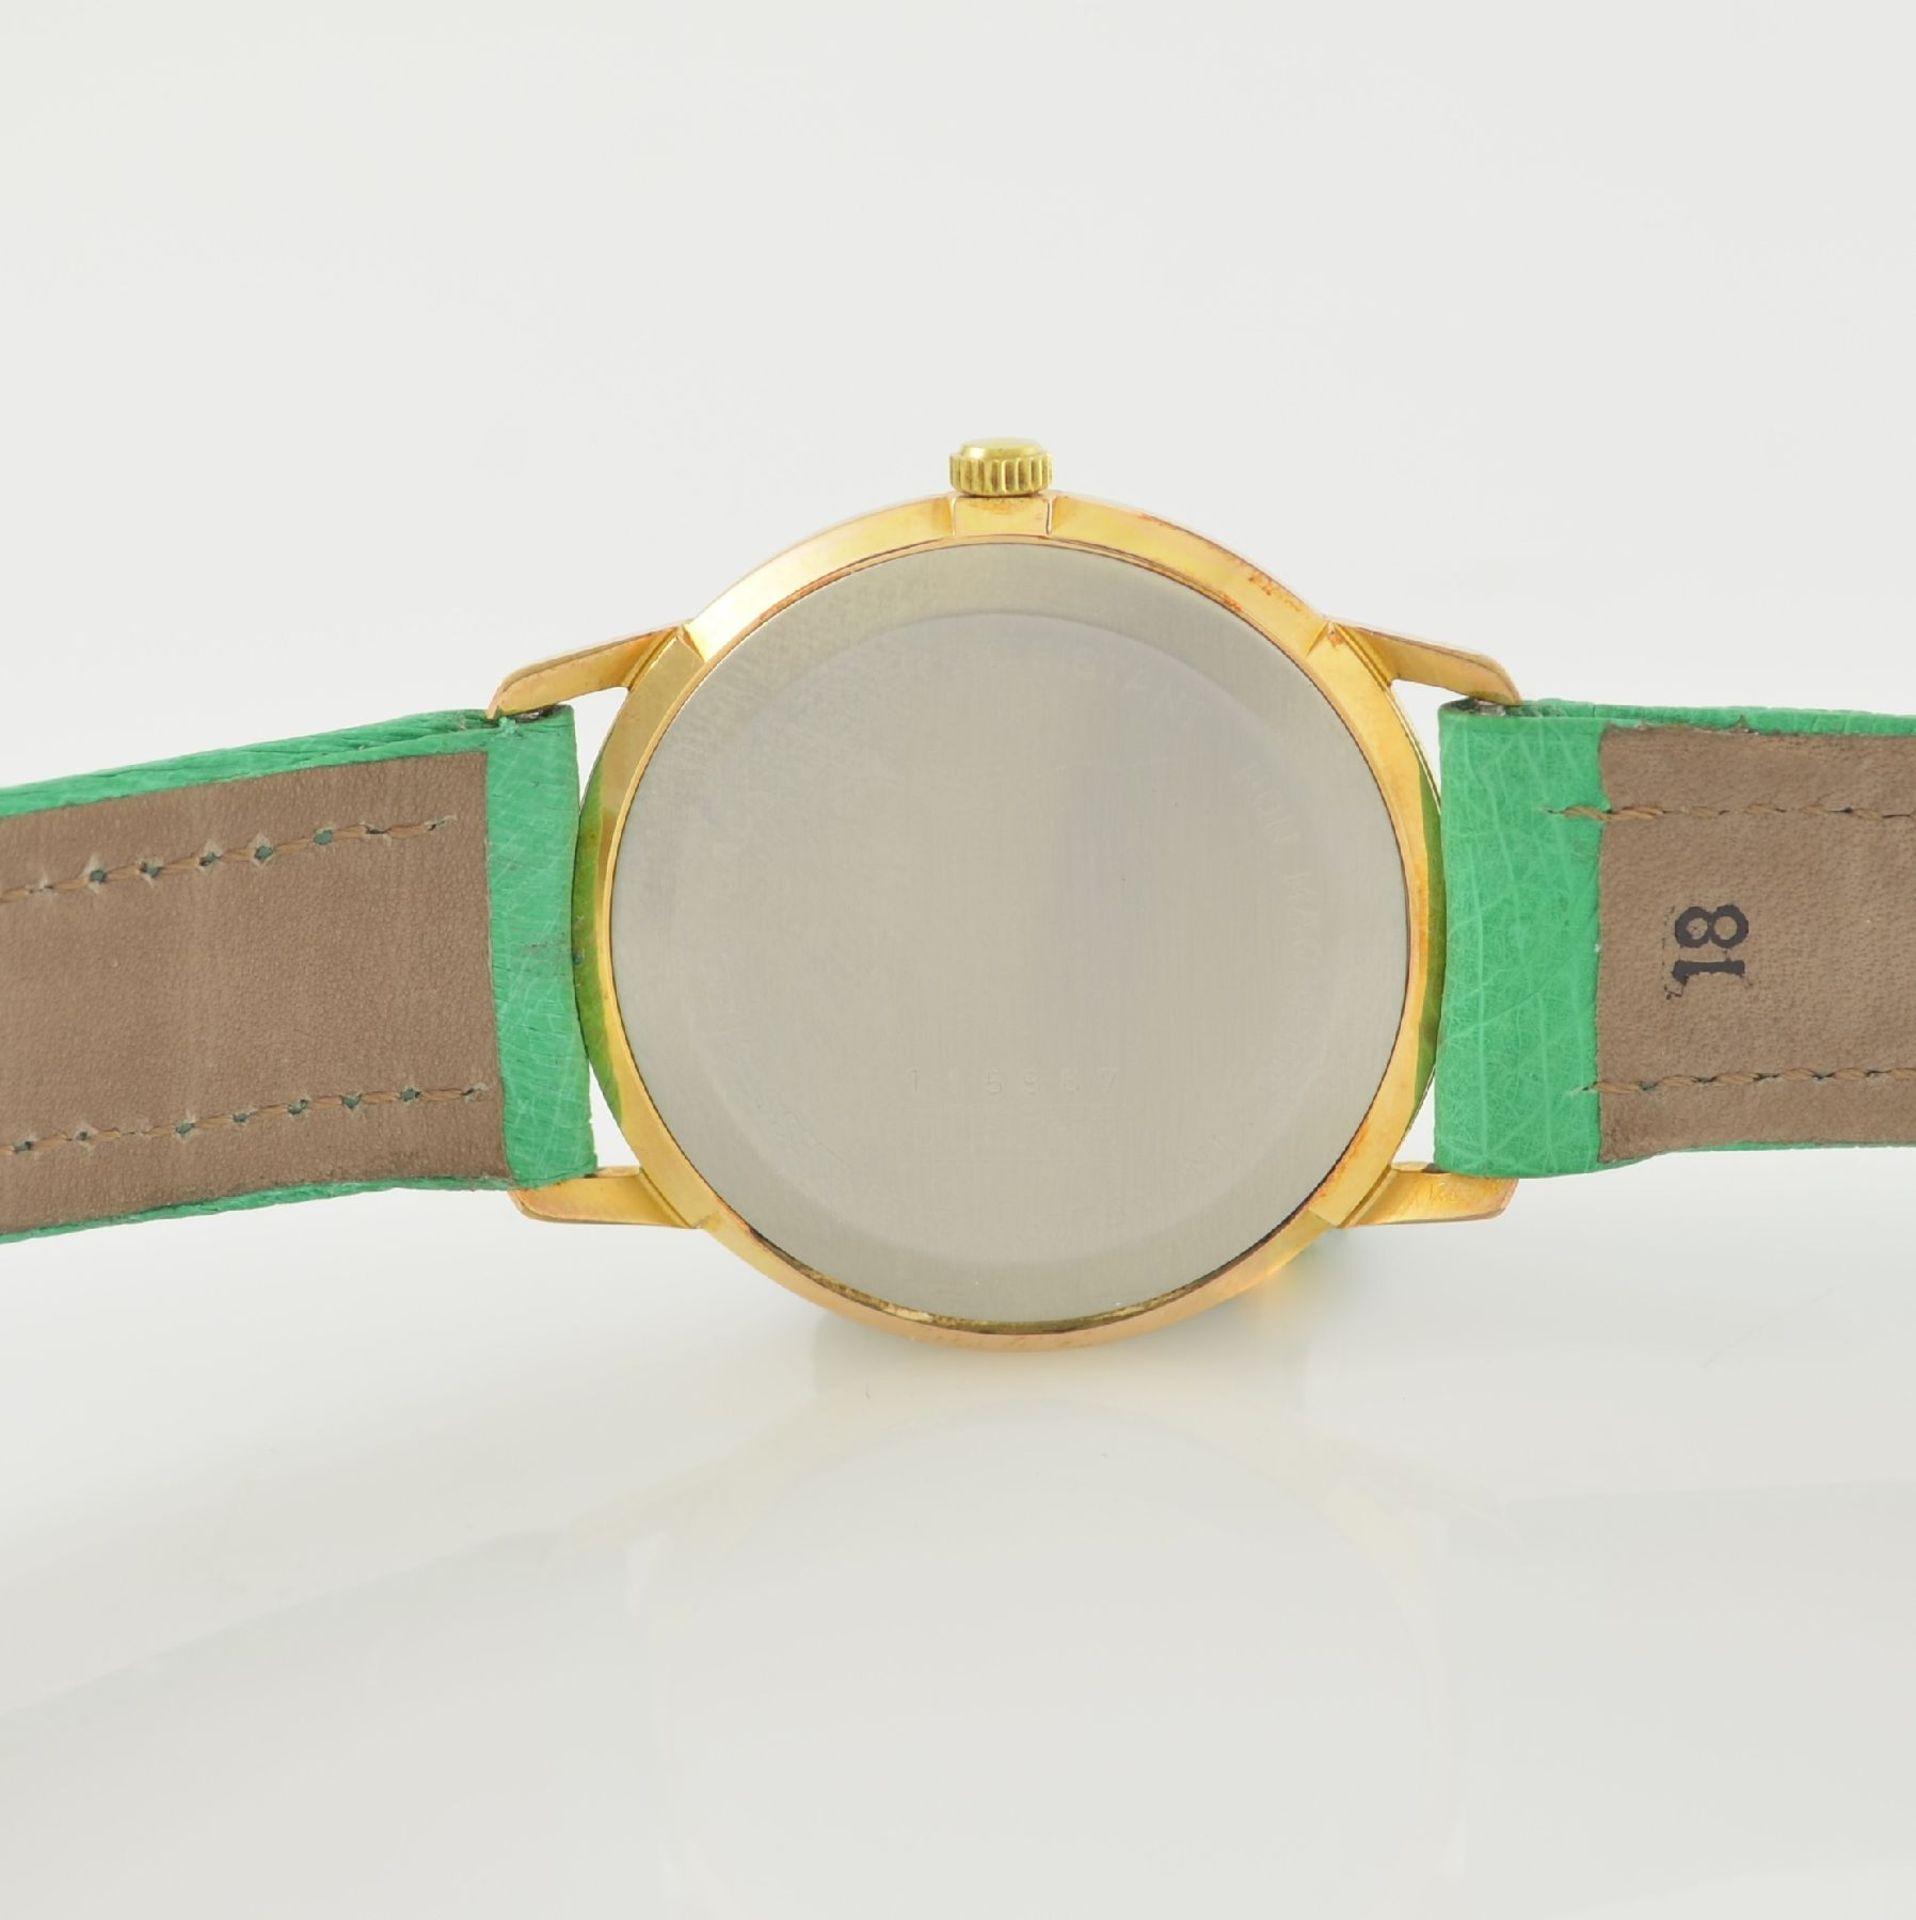 Konvolut: 2 Armbanduhren, beide Schweiz um 1970, beide Metall verg., 1 x Arsa Armbandwecker, Boden - Bild 12 aus 12